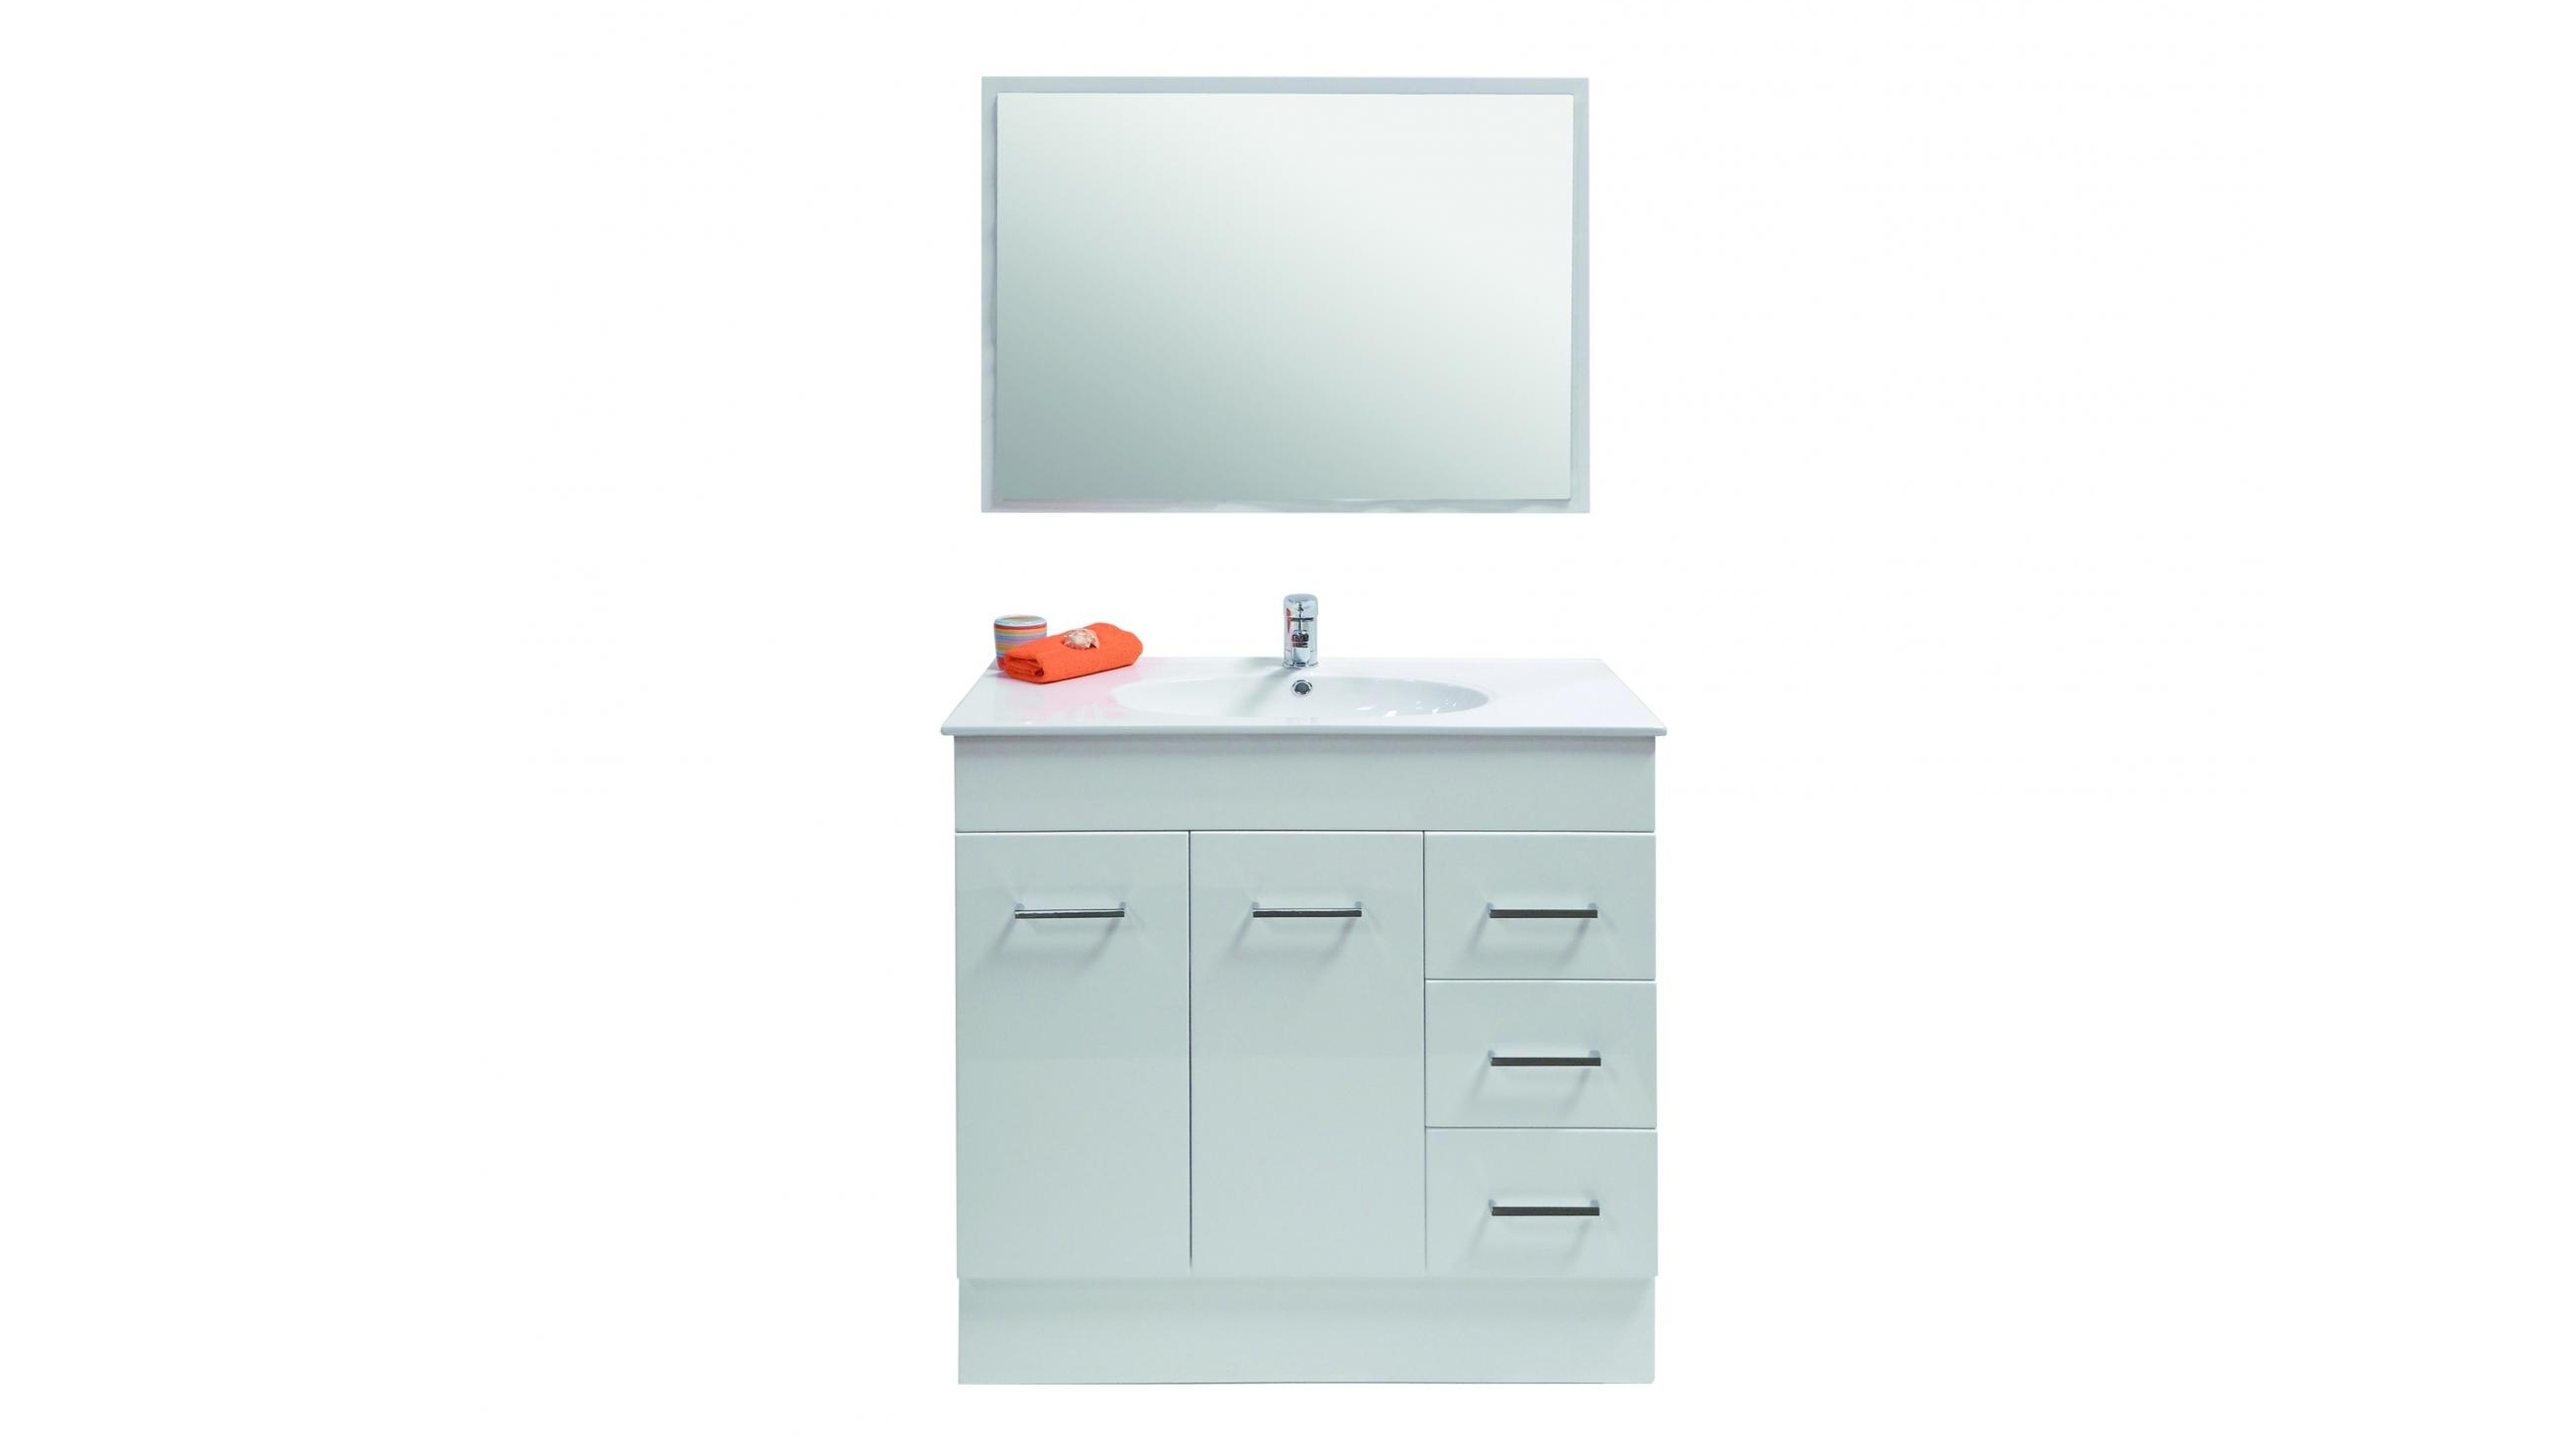 Buy Ledin Orion 900mm Vanity | Harvey Norman AU